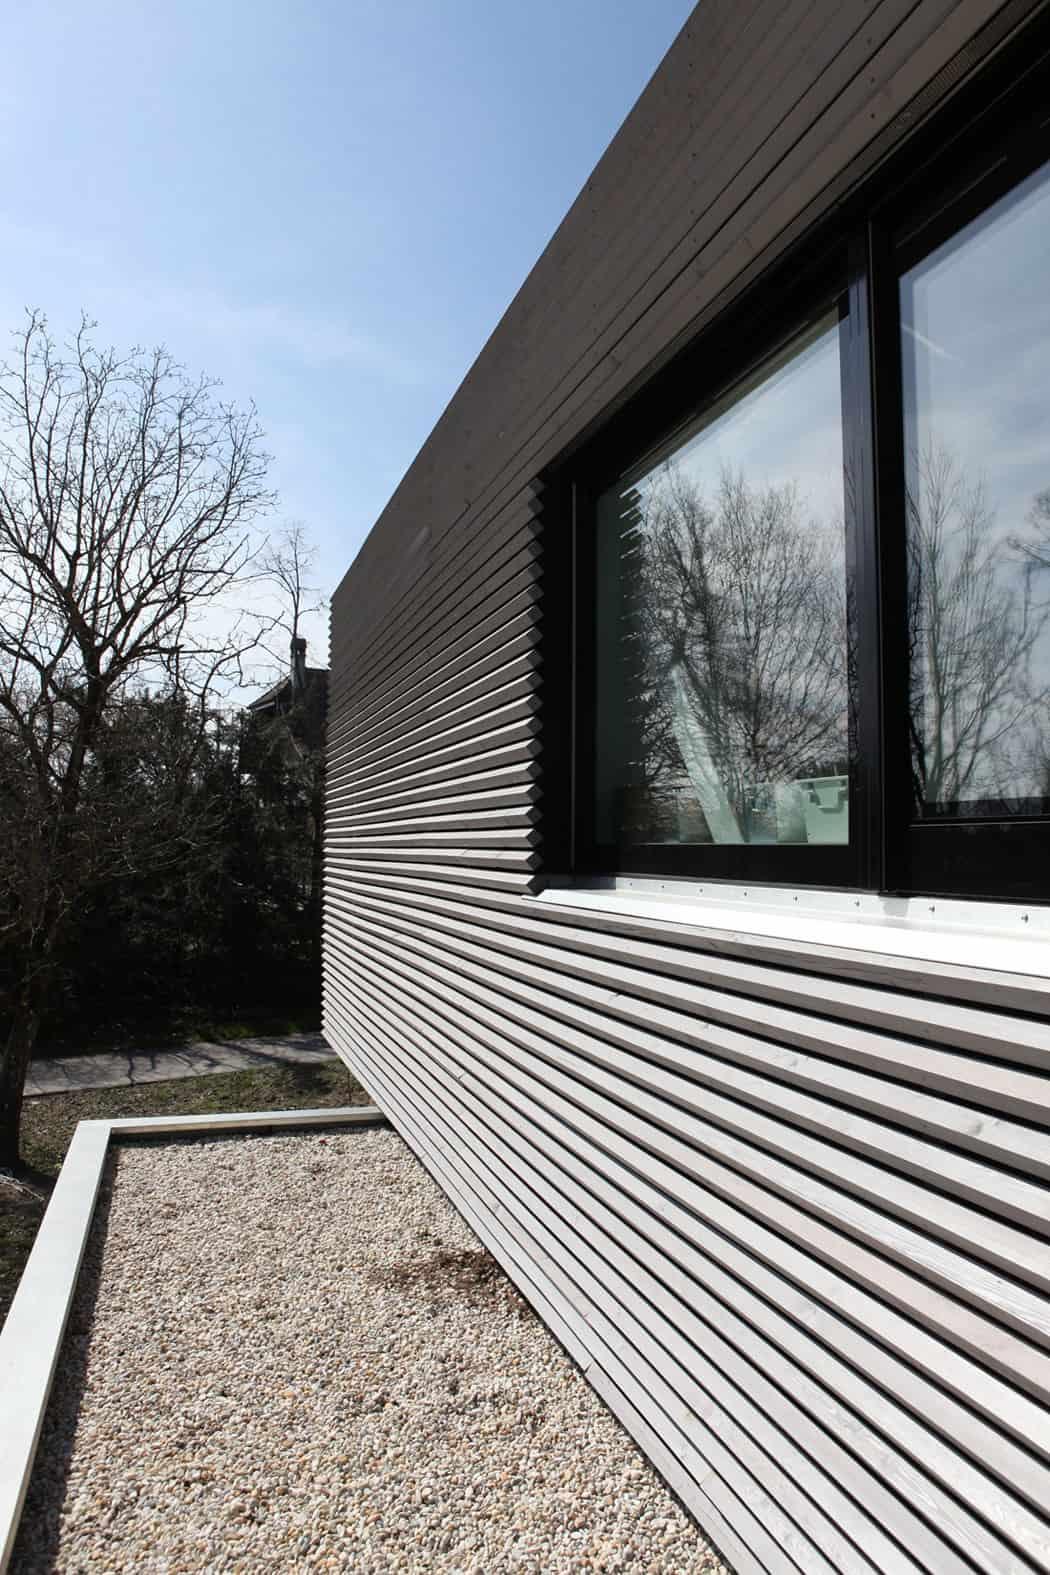 A Single Family House by Christian von Düring architecte (7)